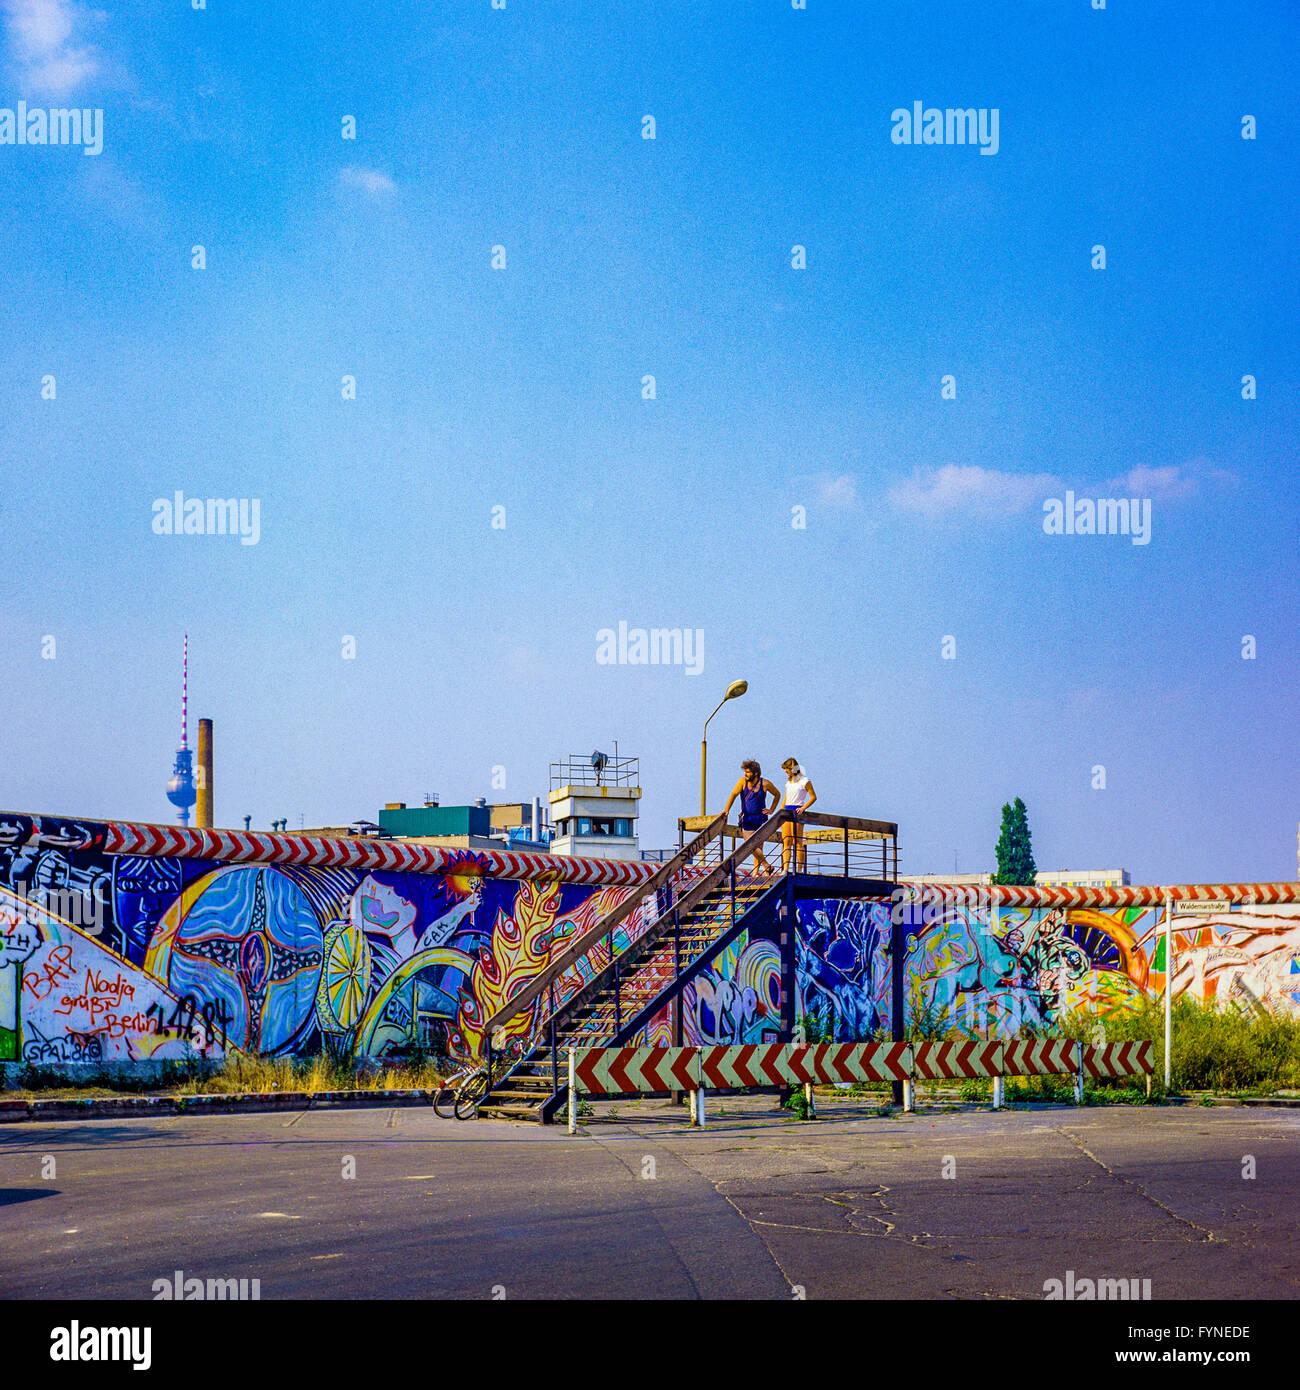 August 1986, Berlin Wall graffitis, young couple on observation platform, East Berlin watchtower, Kreuzberg, West - Stock Image